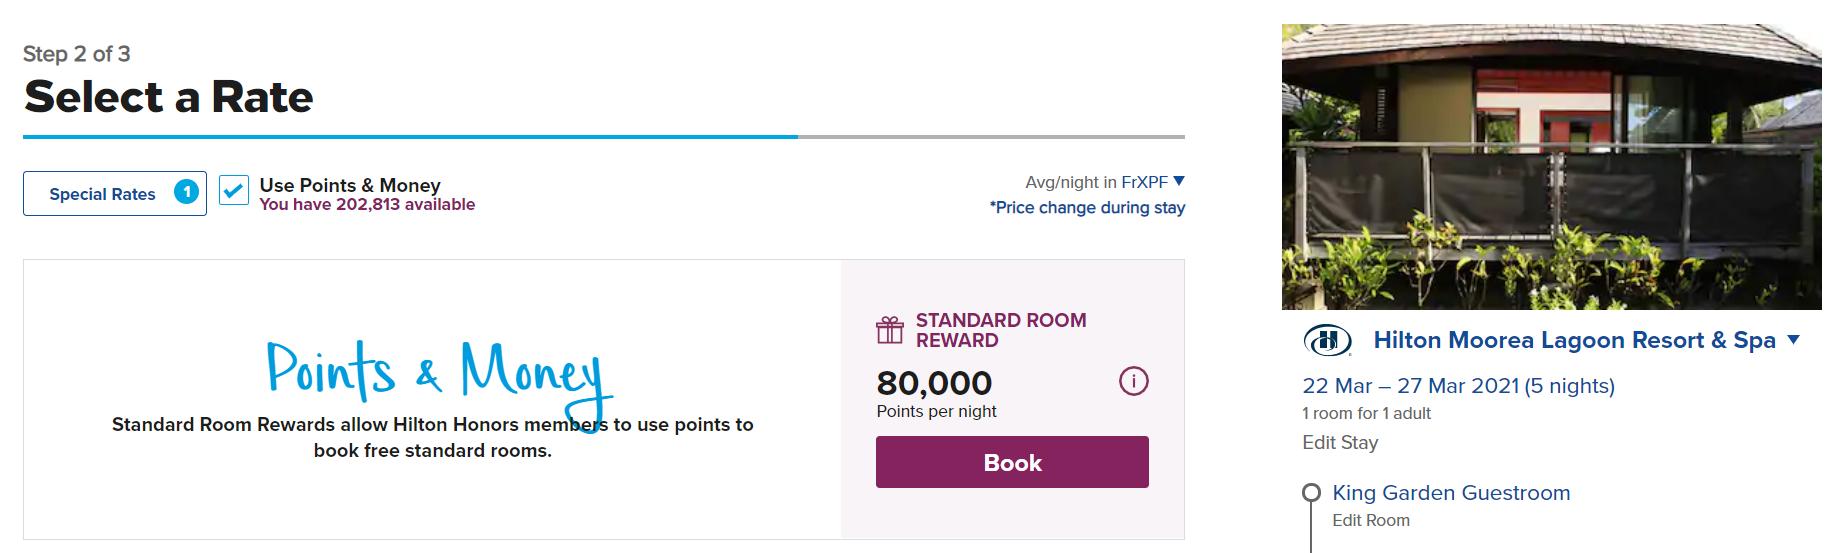 Screenshot of Hilton award booking page showing standard room reward of 80,000 points per night.